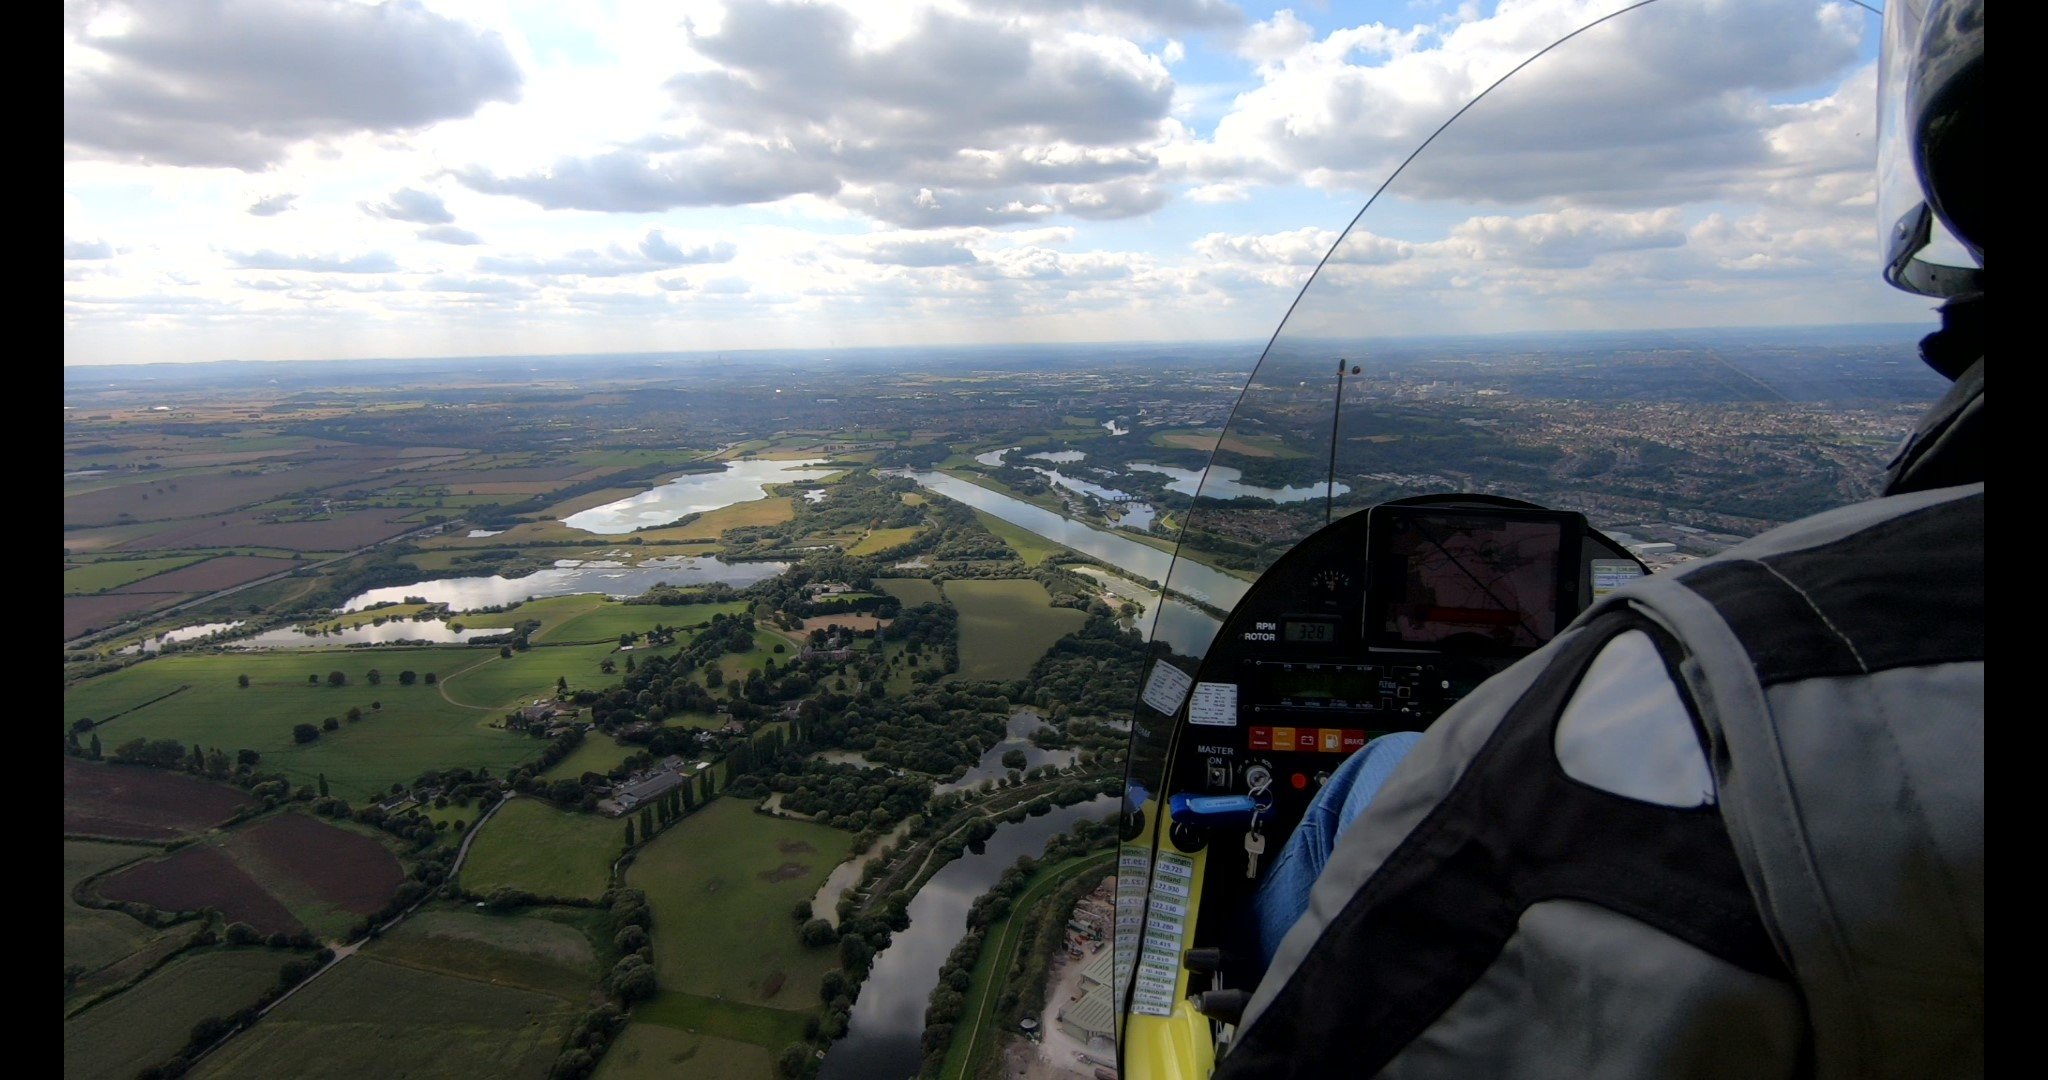 Wiederaufnahme des Nottingham City Airport Circuit im September 2019